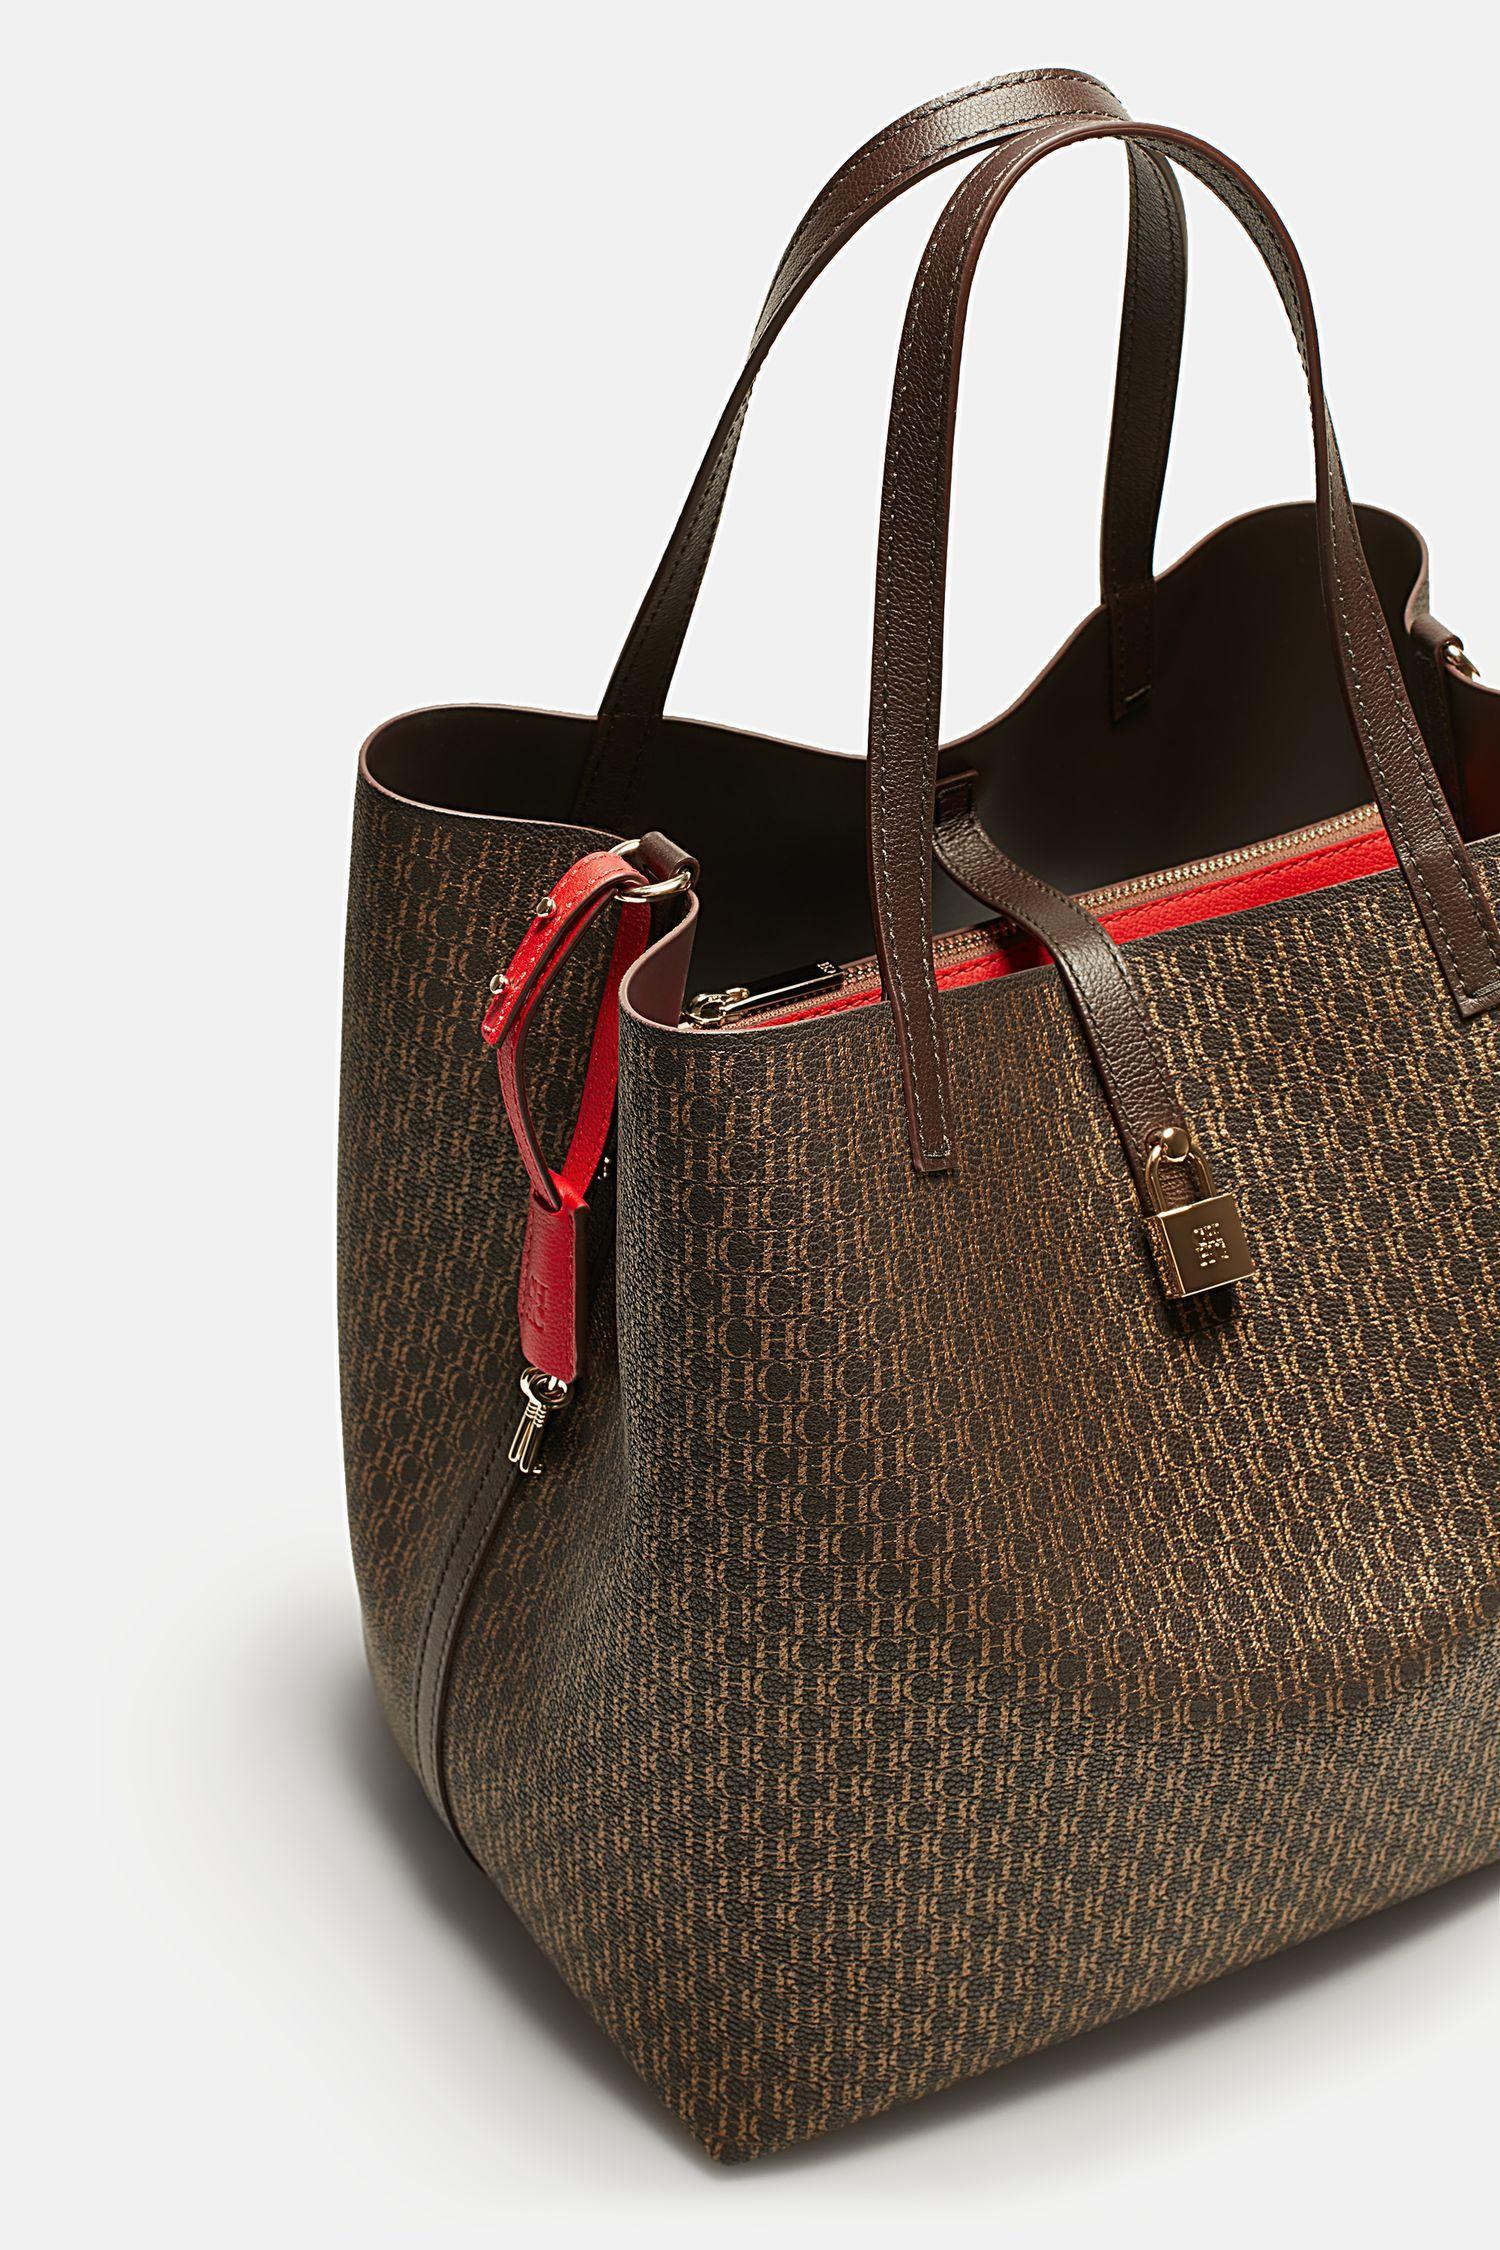 f78f3be40 Matryoshka Locked L | Bolso de hombro grande Louis Vuitton Neverfull,  Carolina Herrera, Grande